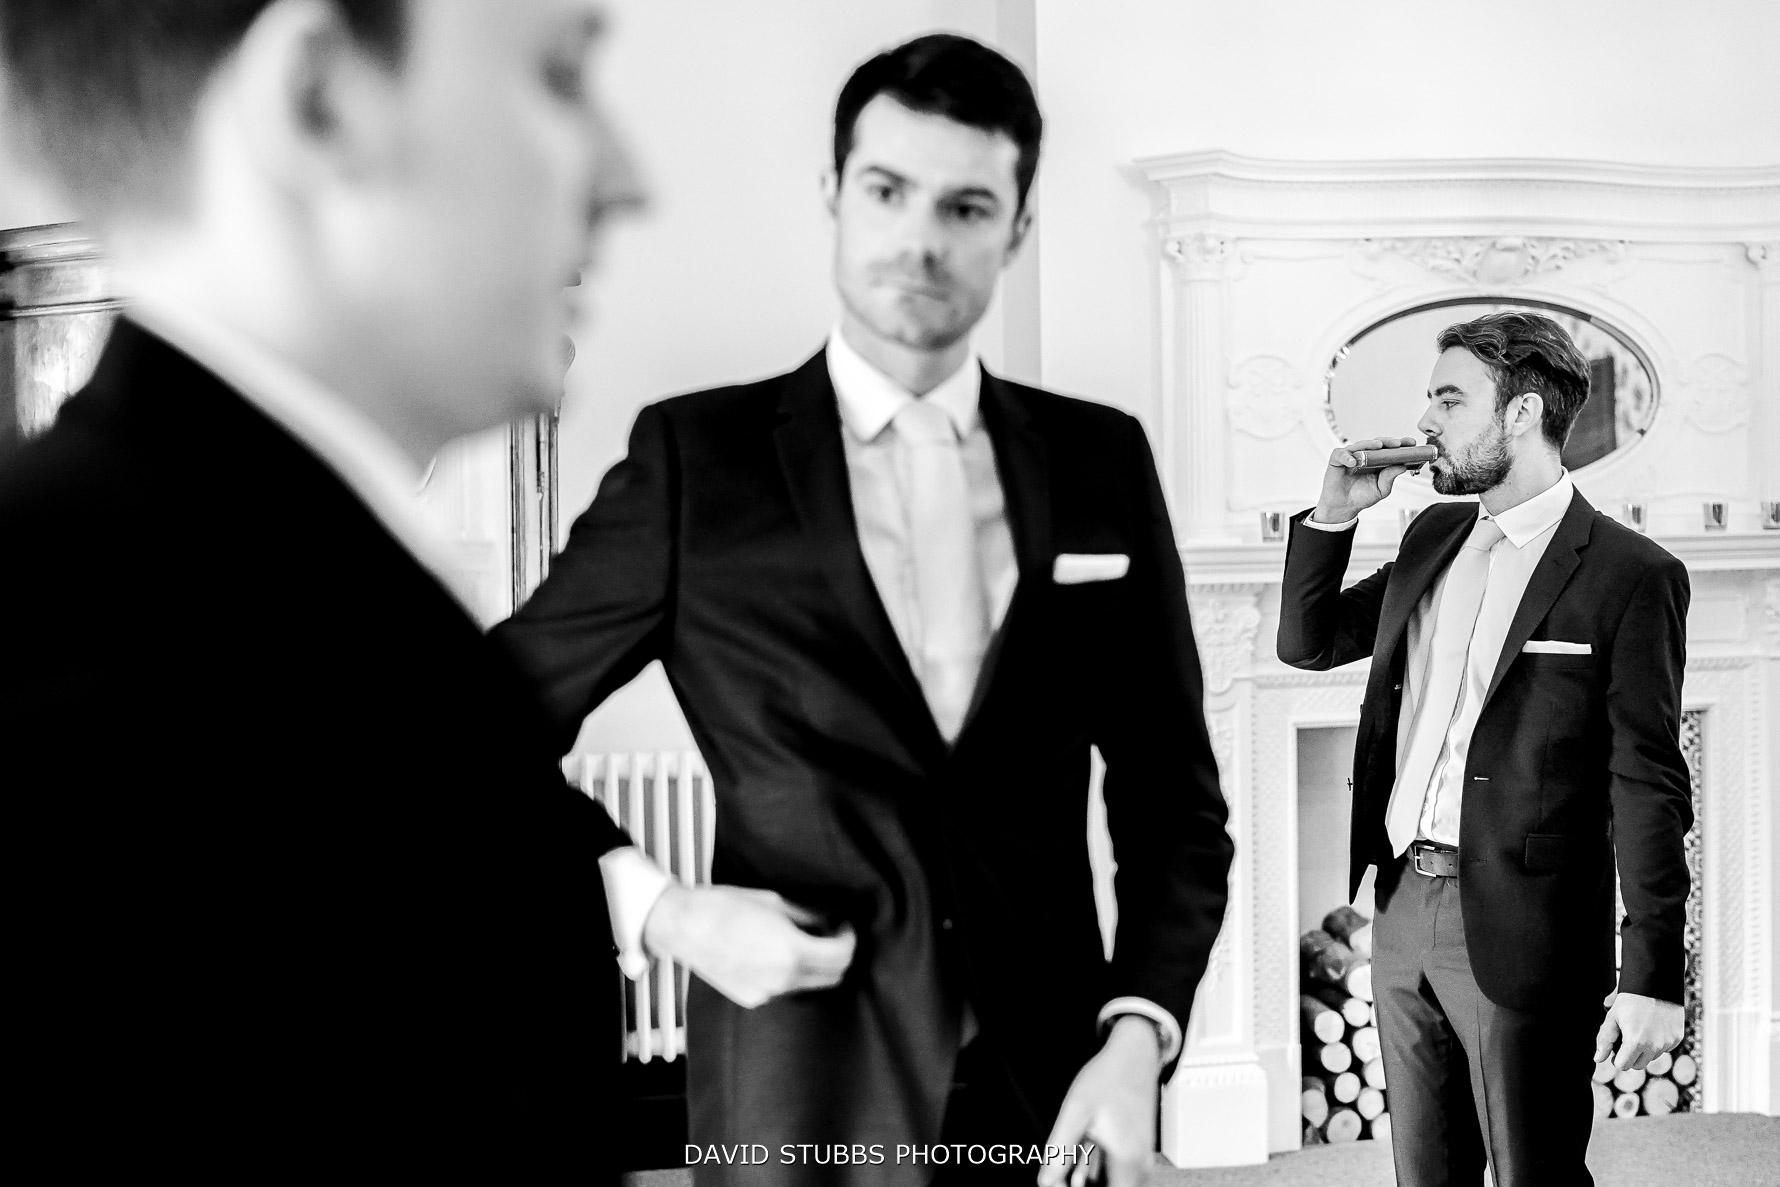 groomsmen enjoying a drink before the wedding ceremony